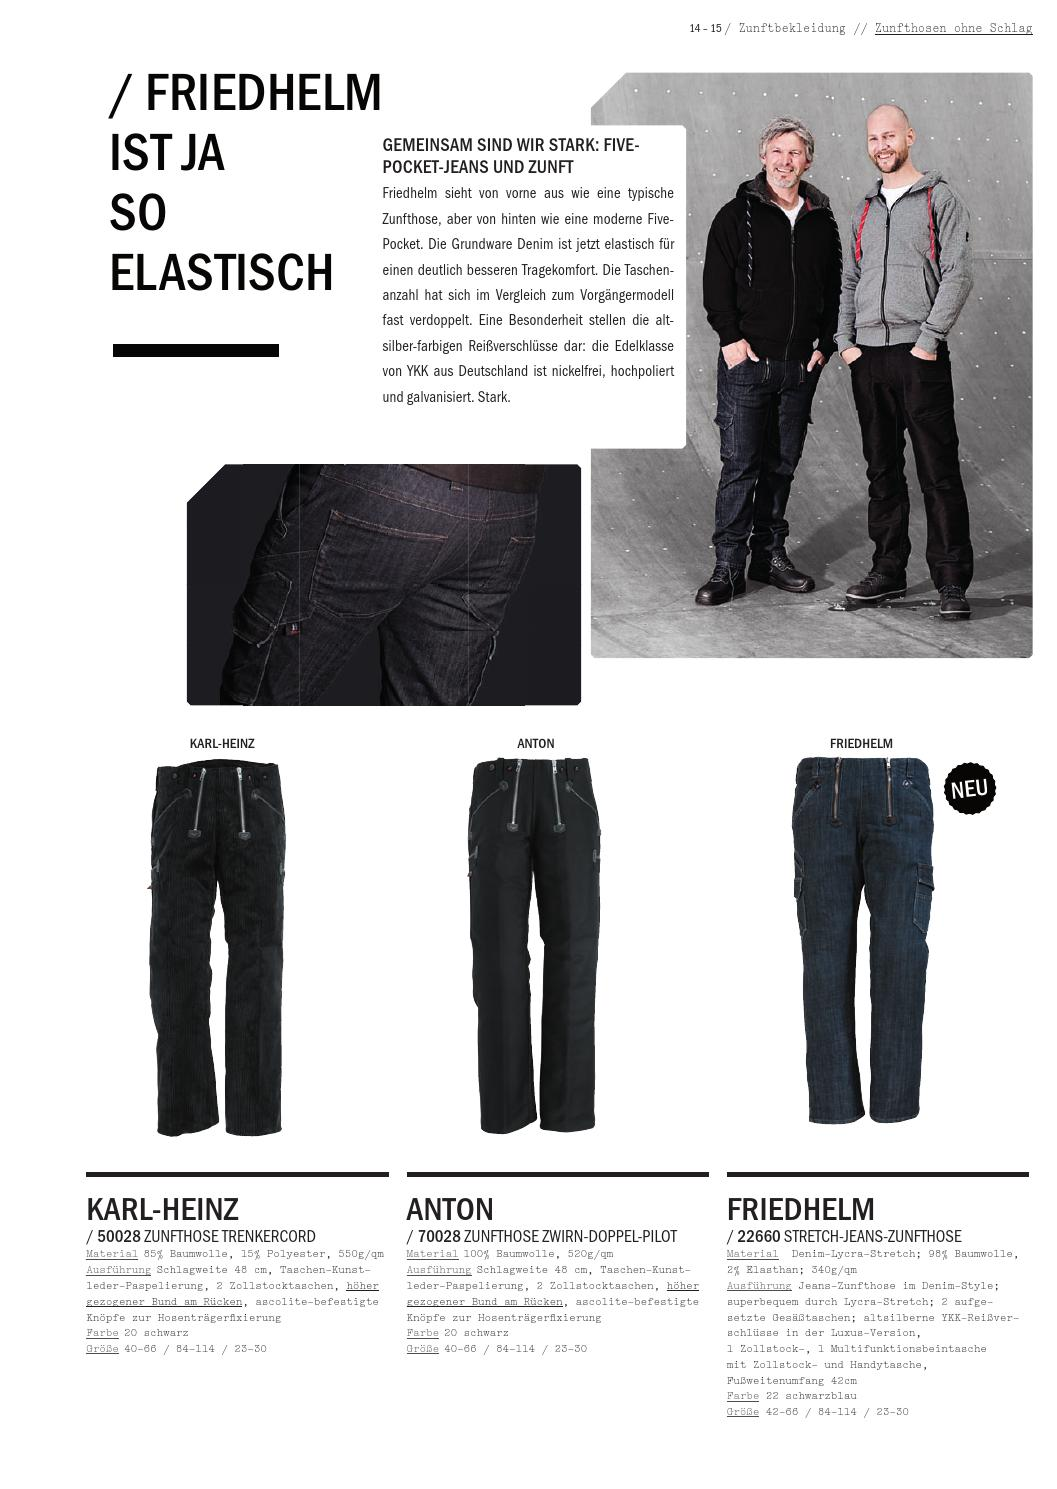 FHB Stretch-Jeans-Zunfthose FRIEDHELM 22660 22-schwarzblau